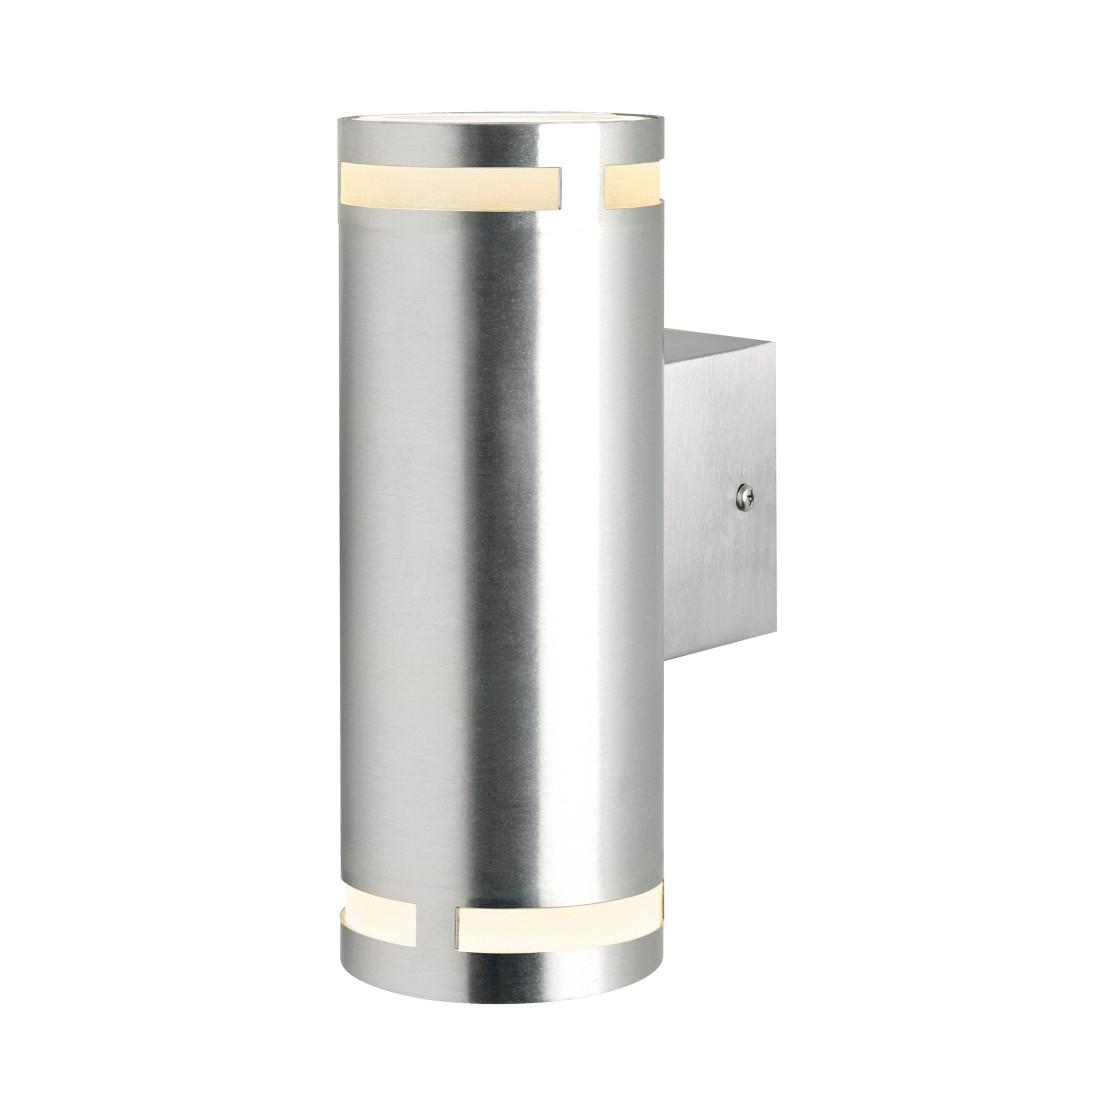 Wandstrahler 2-seitig Can Maxi II ● Aluminium- Nordlux A++